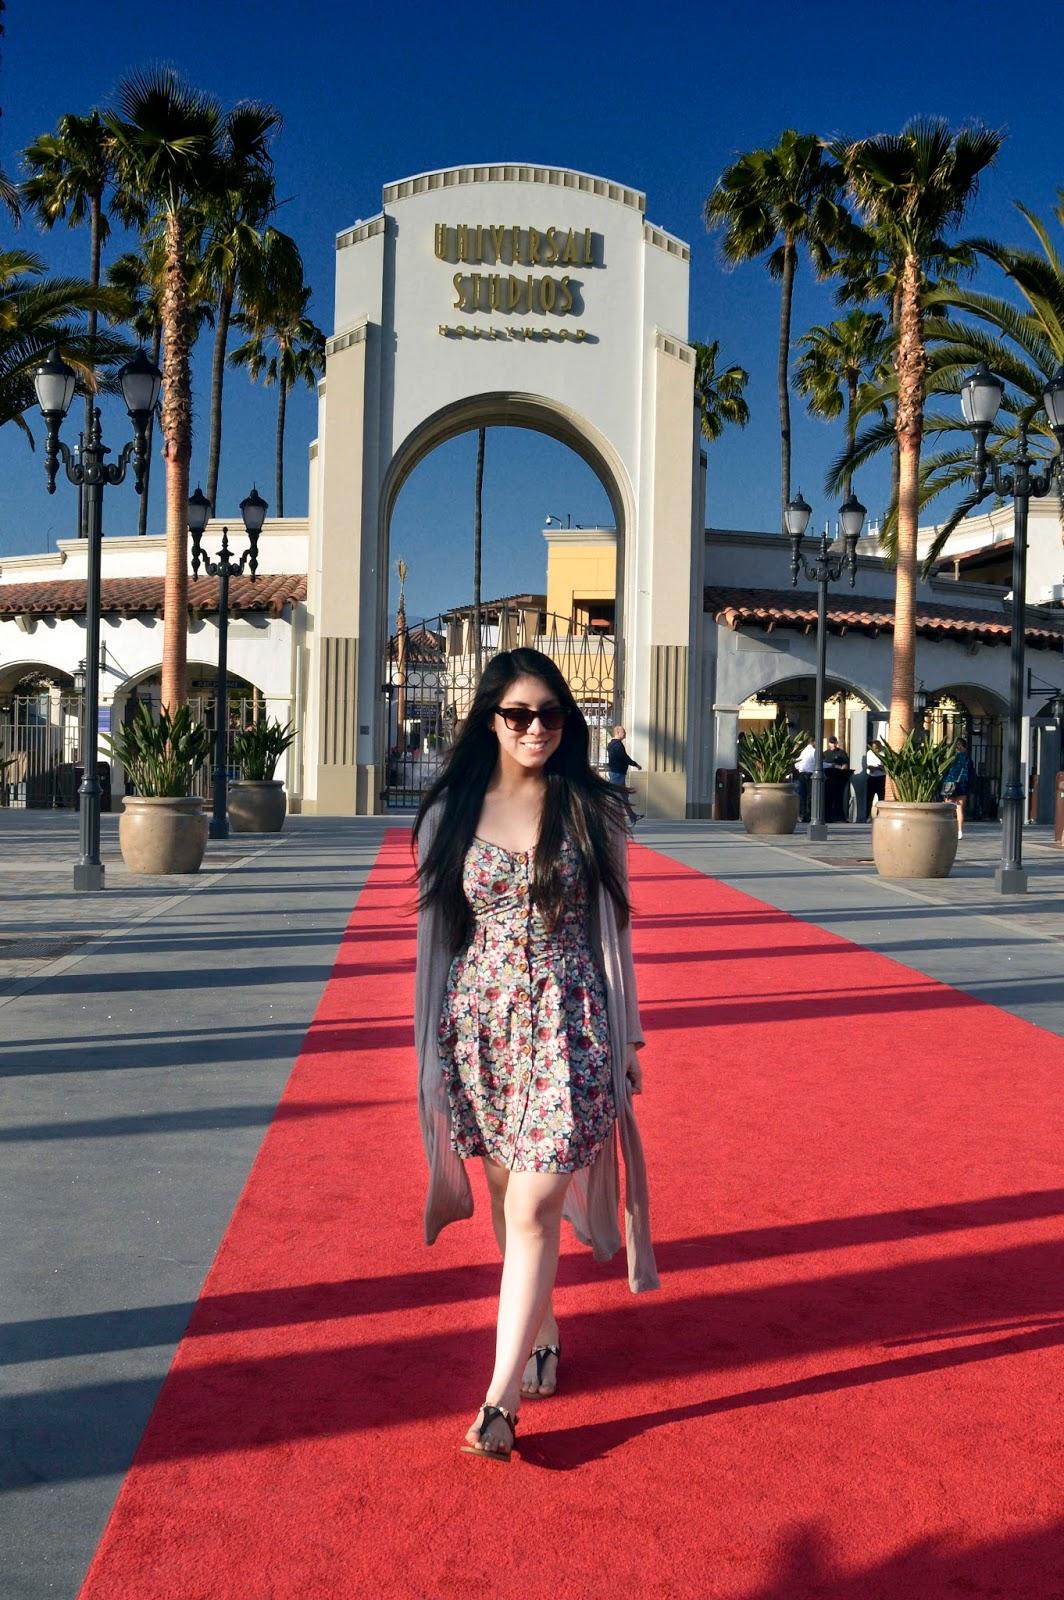 silvia-armas-usa-diary-trip-sunset-travel-fashion-blogger-ecuador-latina-las-vegas-los-angeles-texas-california-style-landscapes-family-universal-studios-hollywood